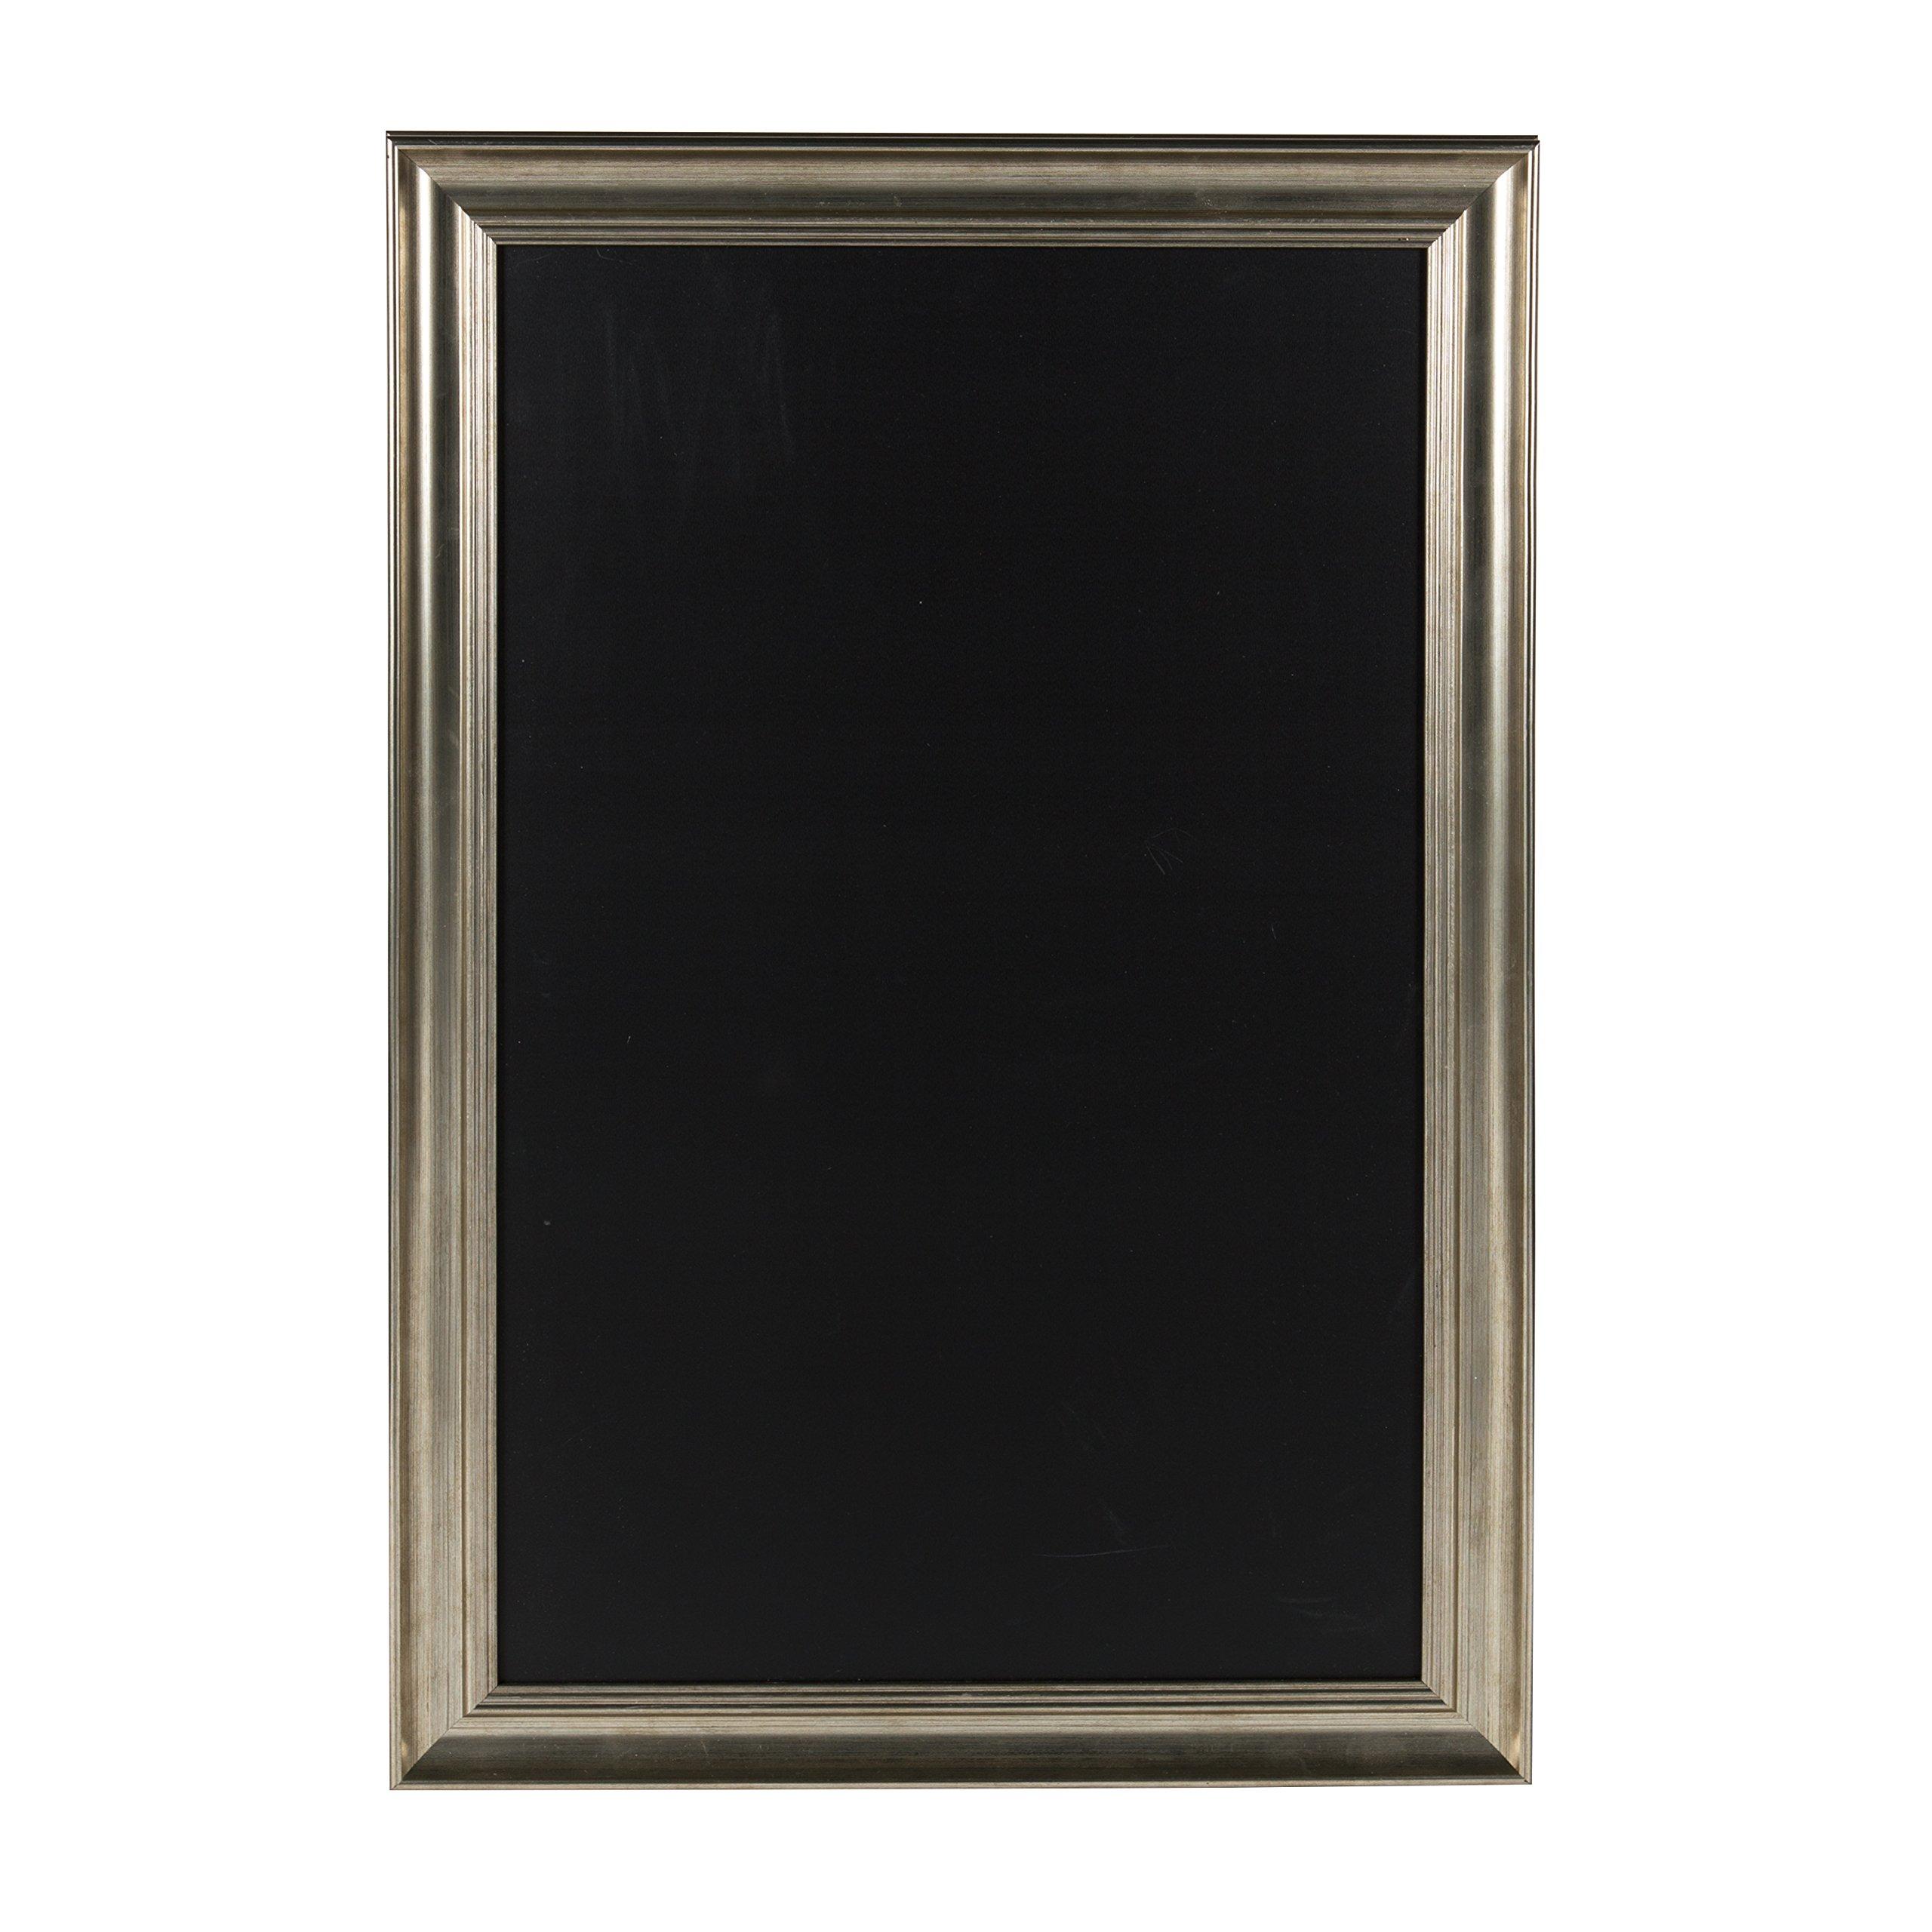 Kate and Laurel Macon Framed Magnetic Chalkboard, 18x27, Pewter